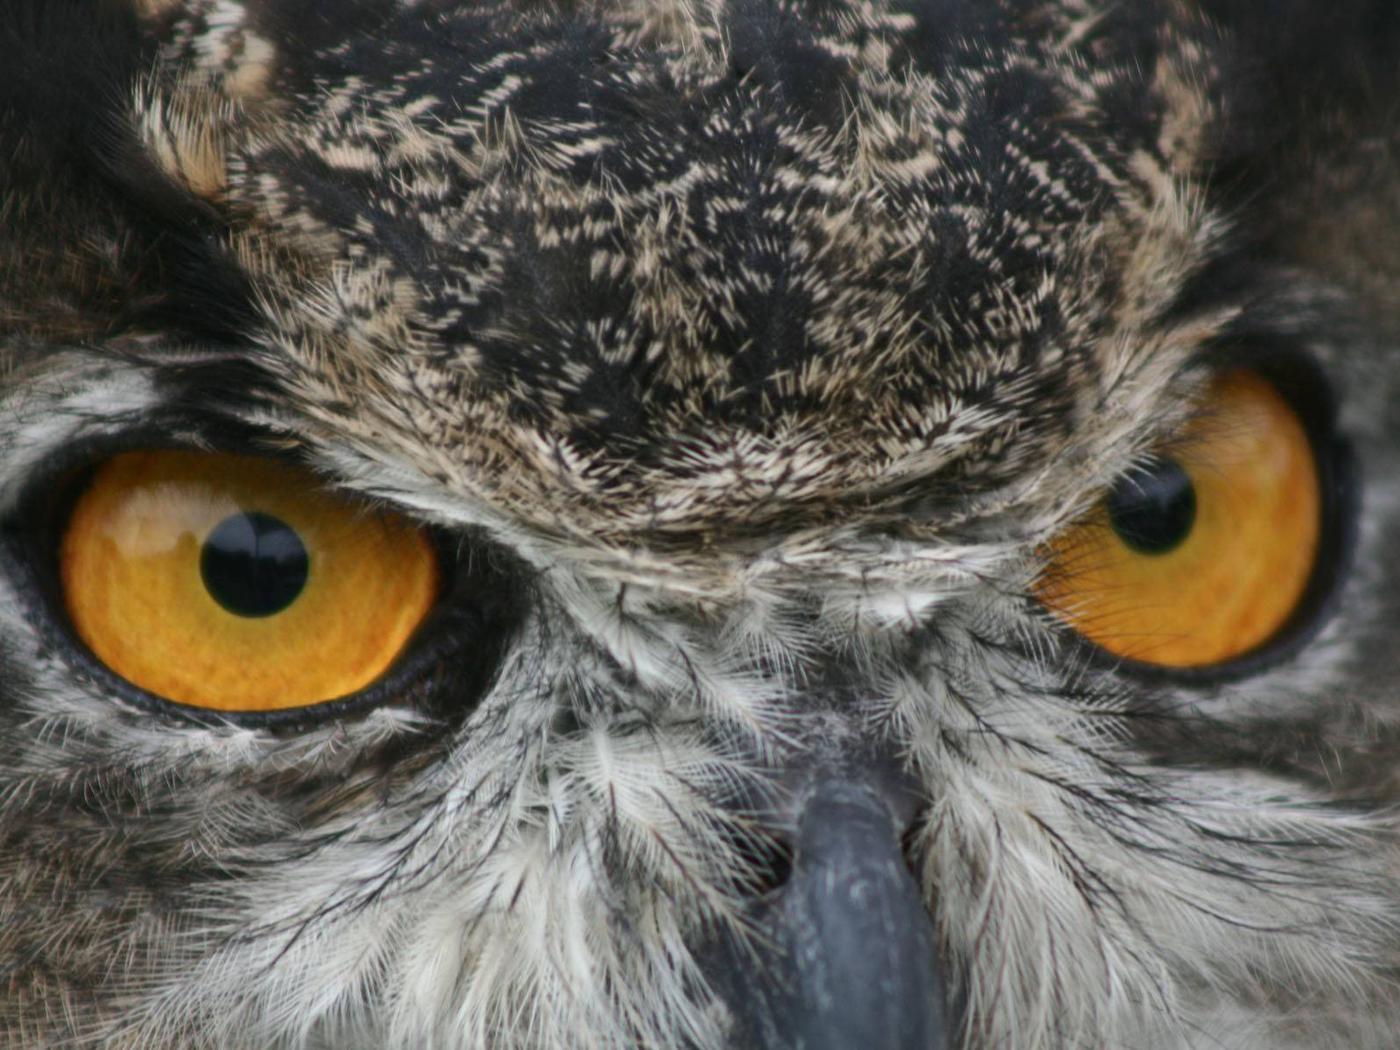 John Heinz at Tinicum National Wildlife RefugeGreat Horned Owl at John Heinz at Tinicum National Wildlife Refuge